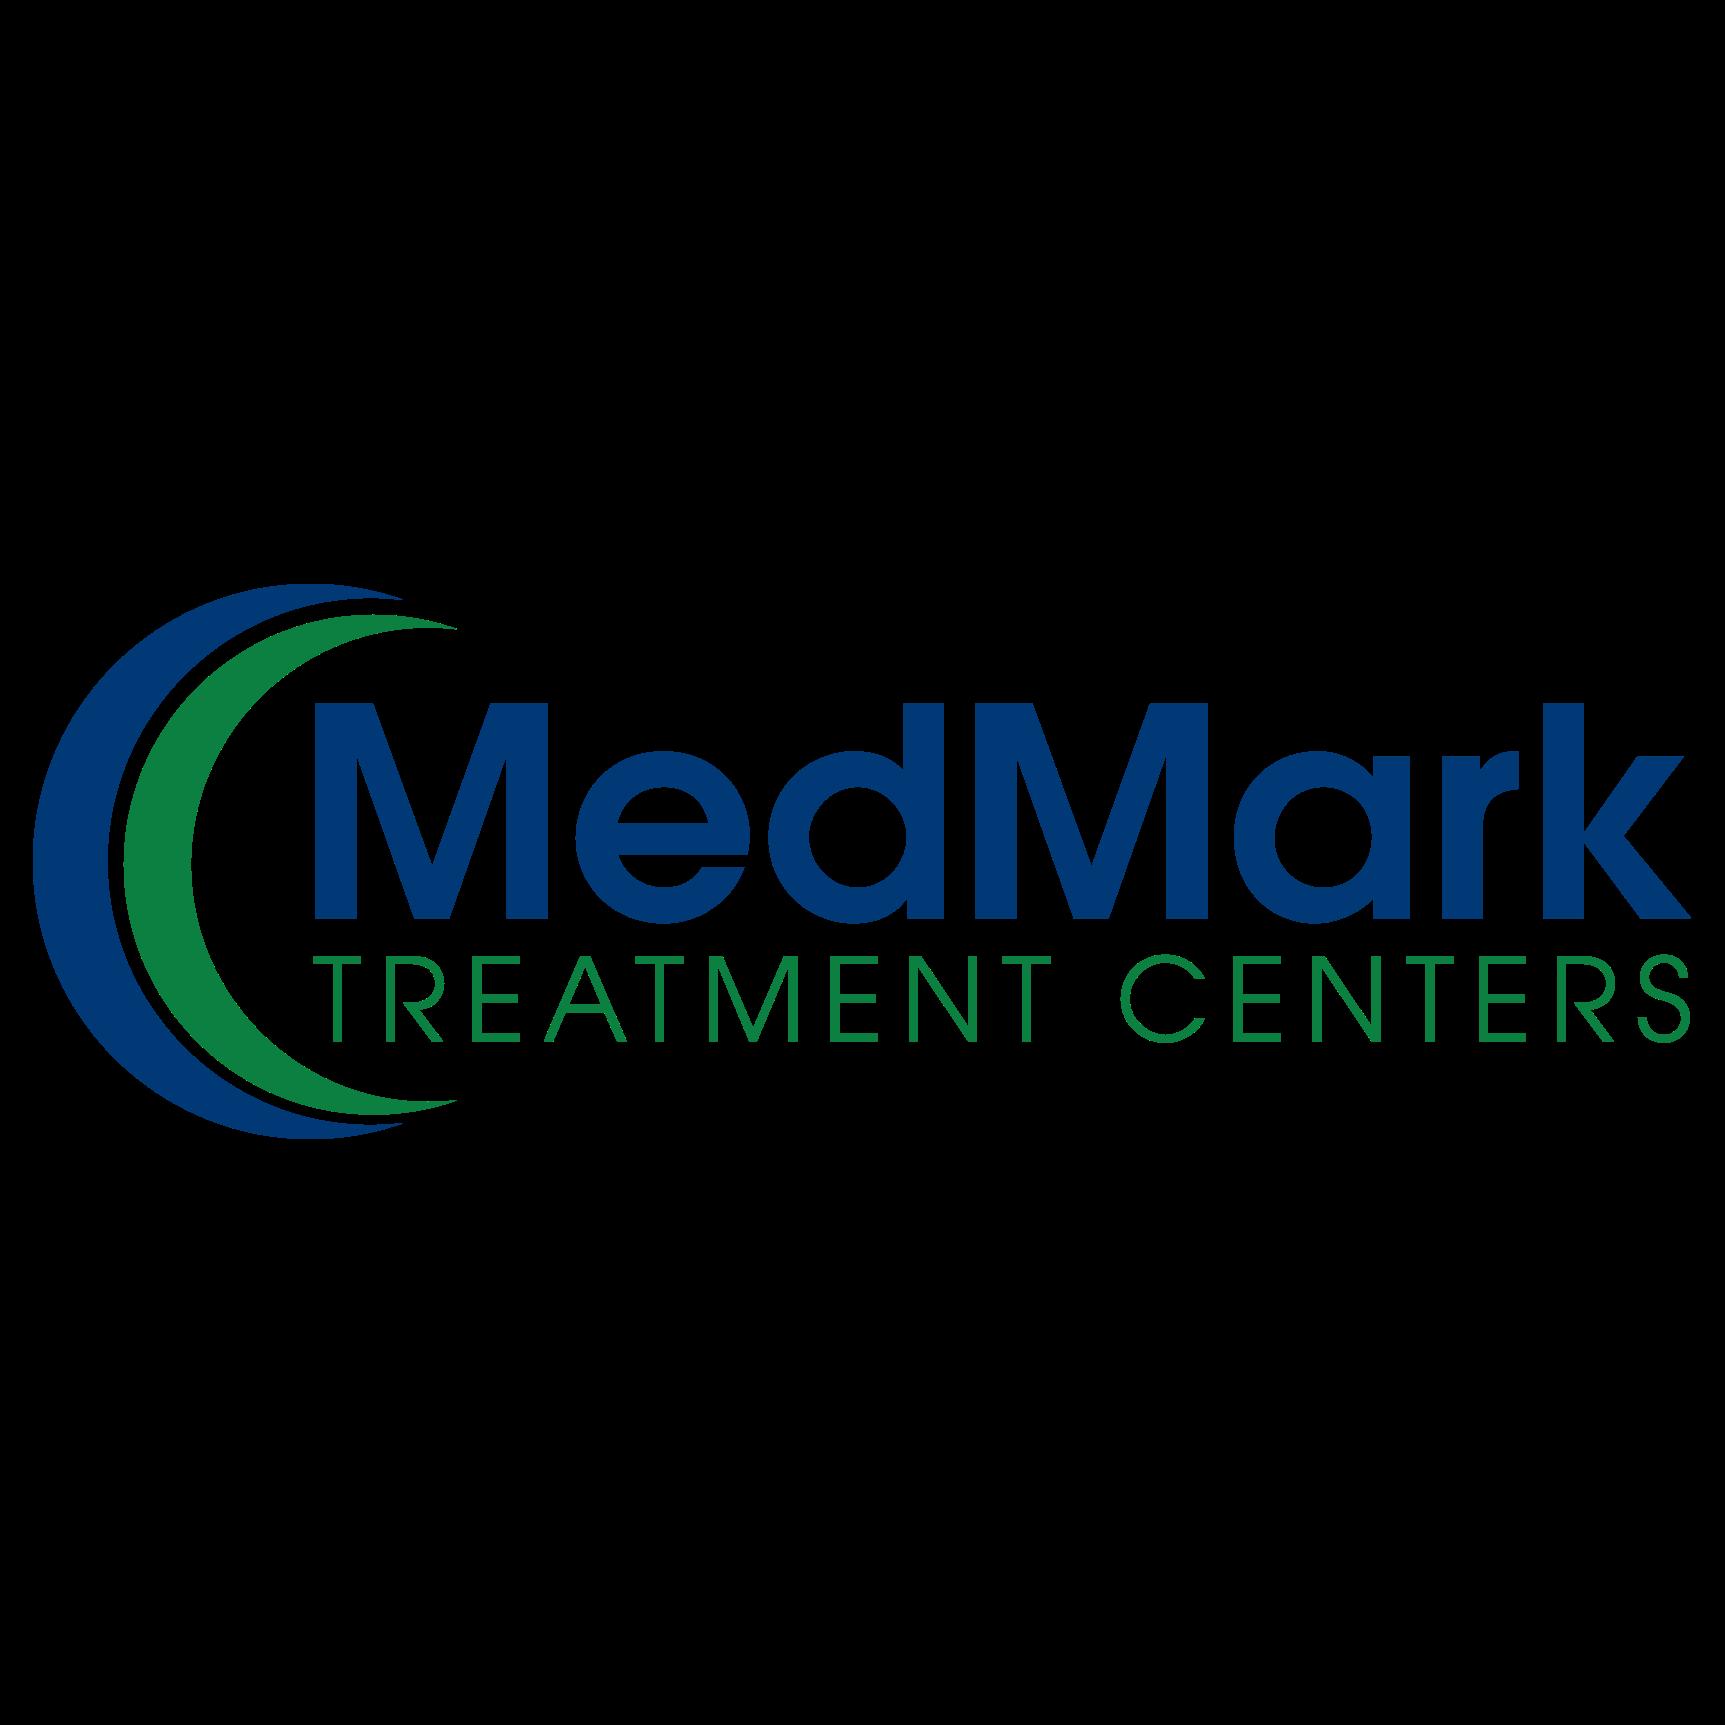 MedMark Treatment Centers El Paso - El Paso, TX - Mental Health Services